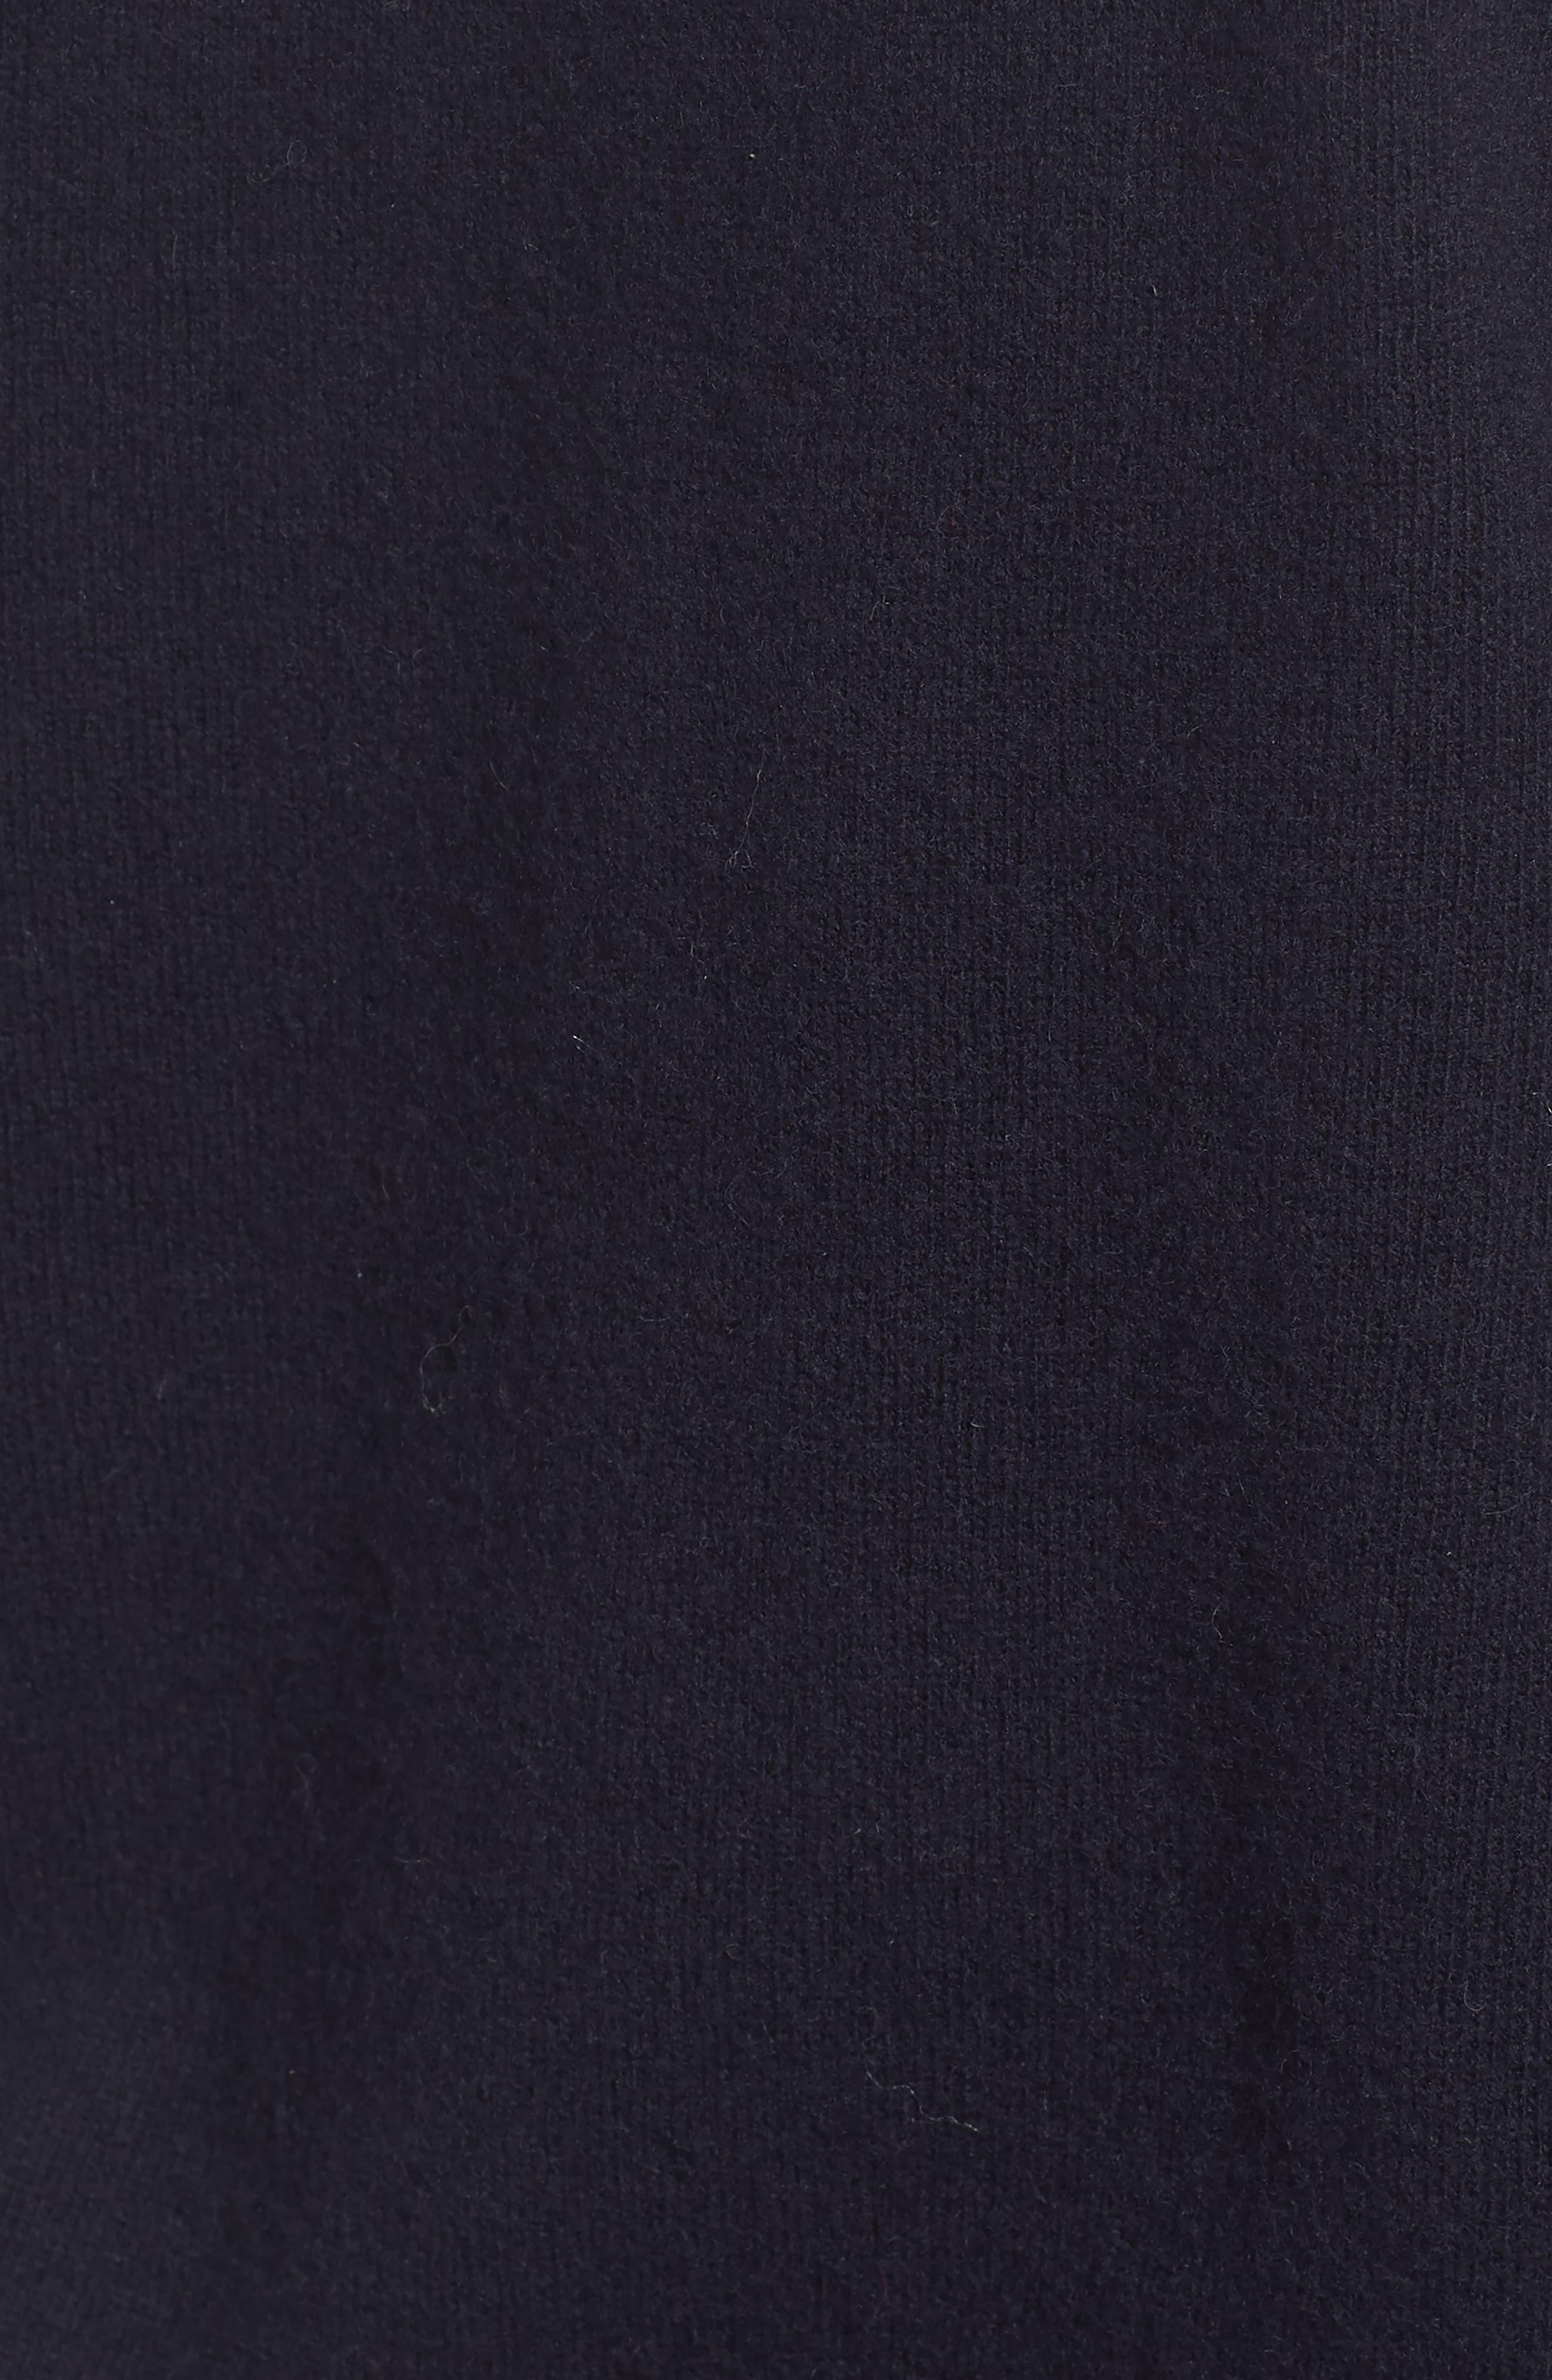 Crewneck Wool Sweater,                             Alternate thumbnail 5, color,                             429